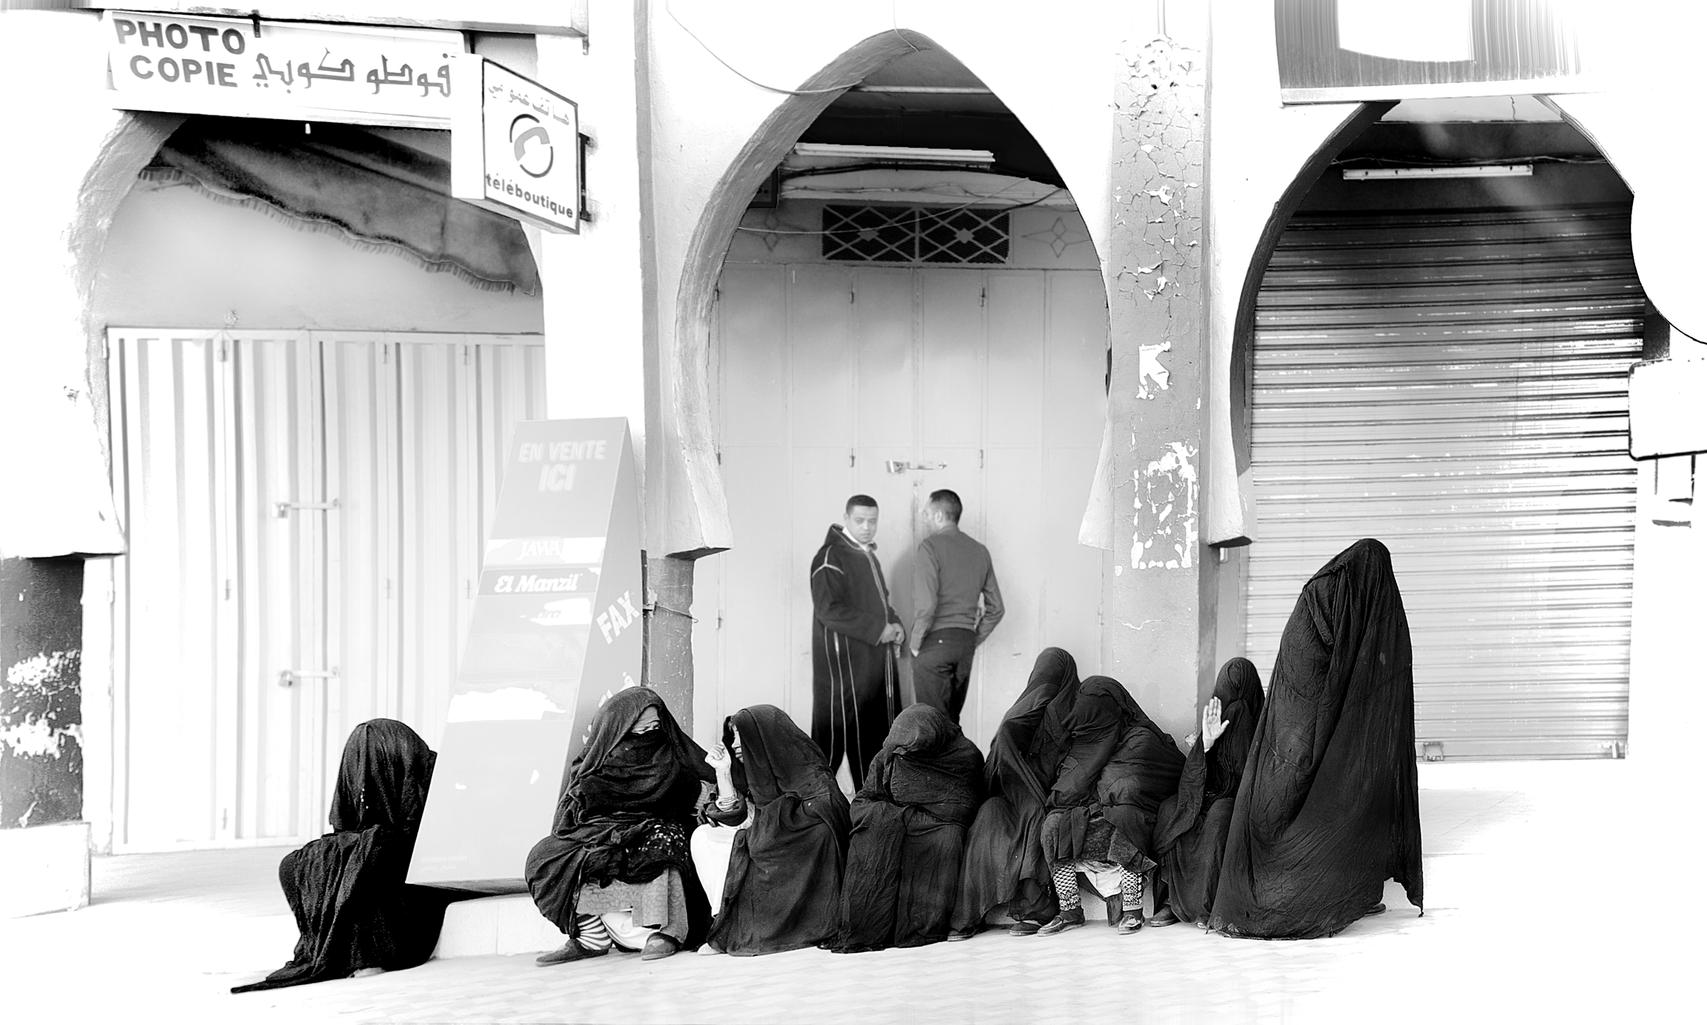 Photographed women